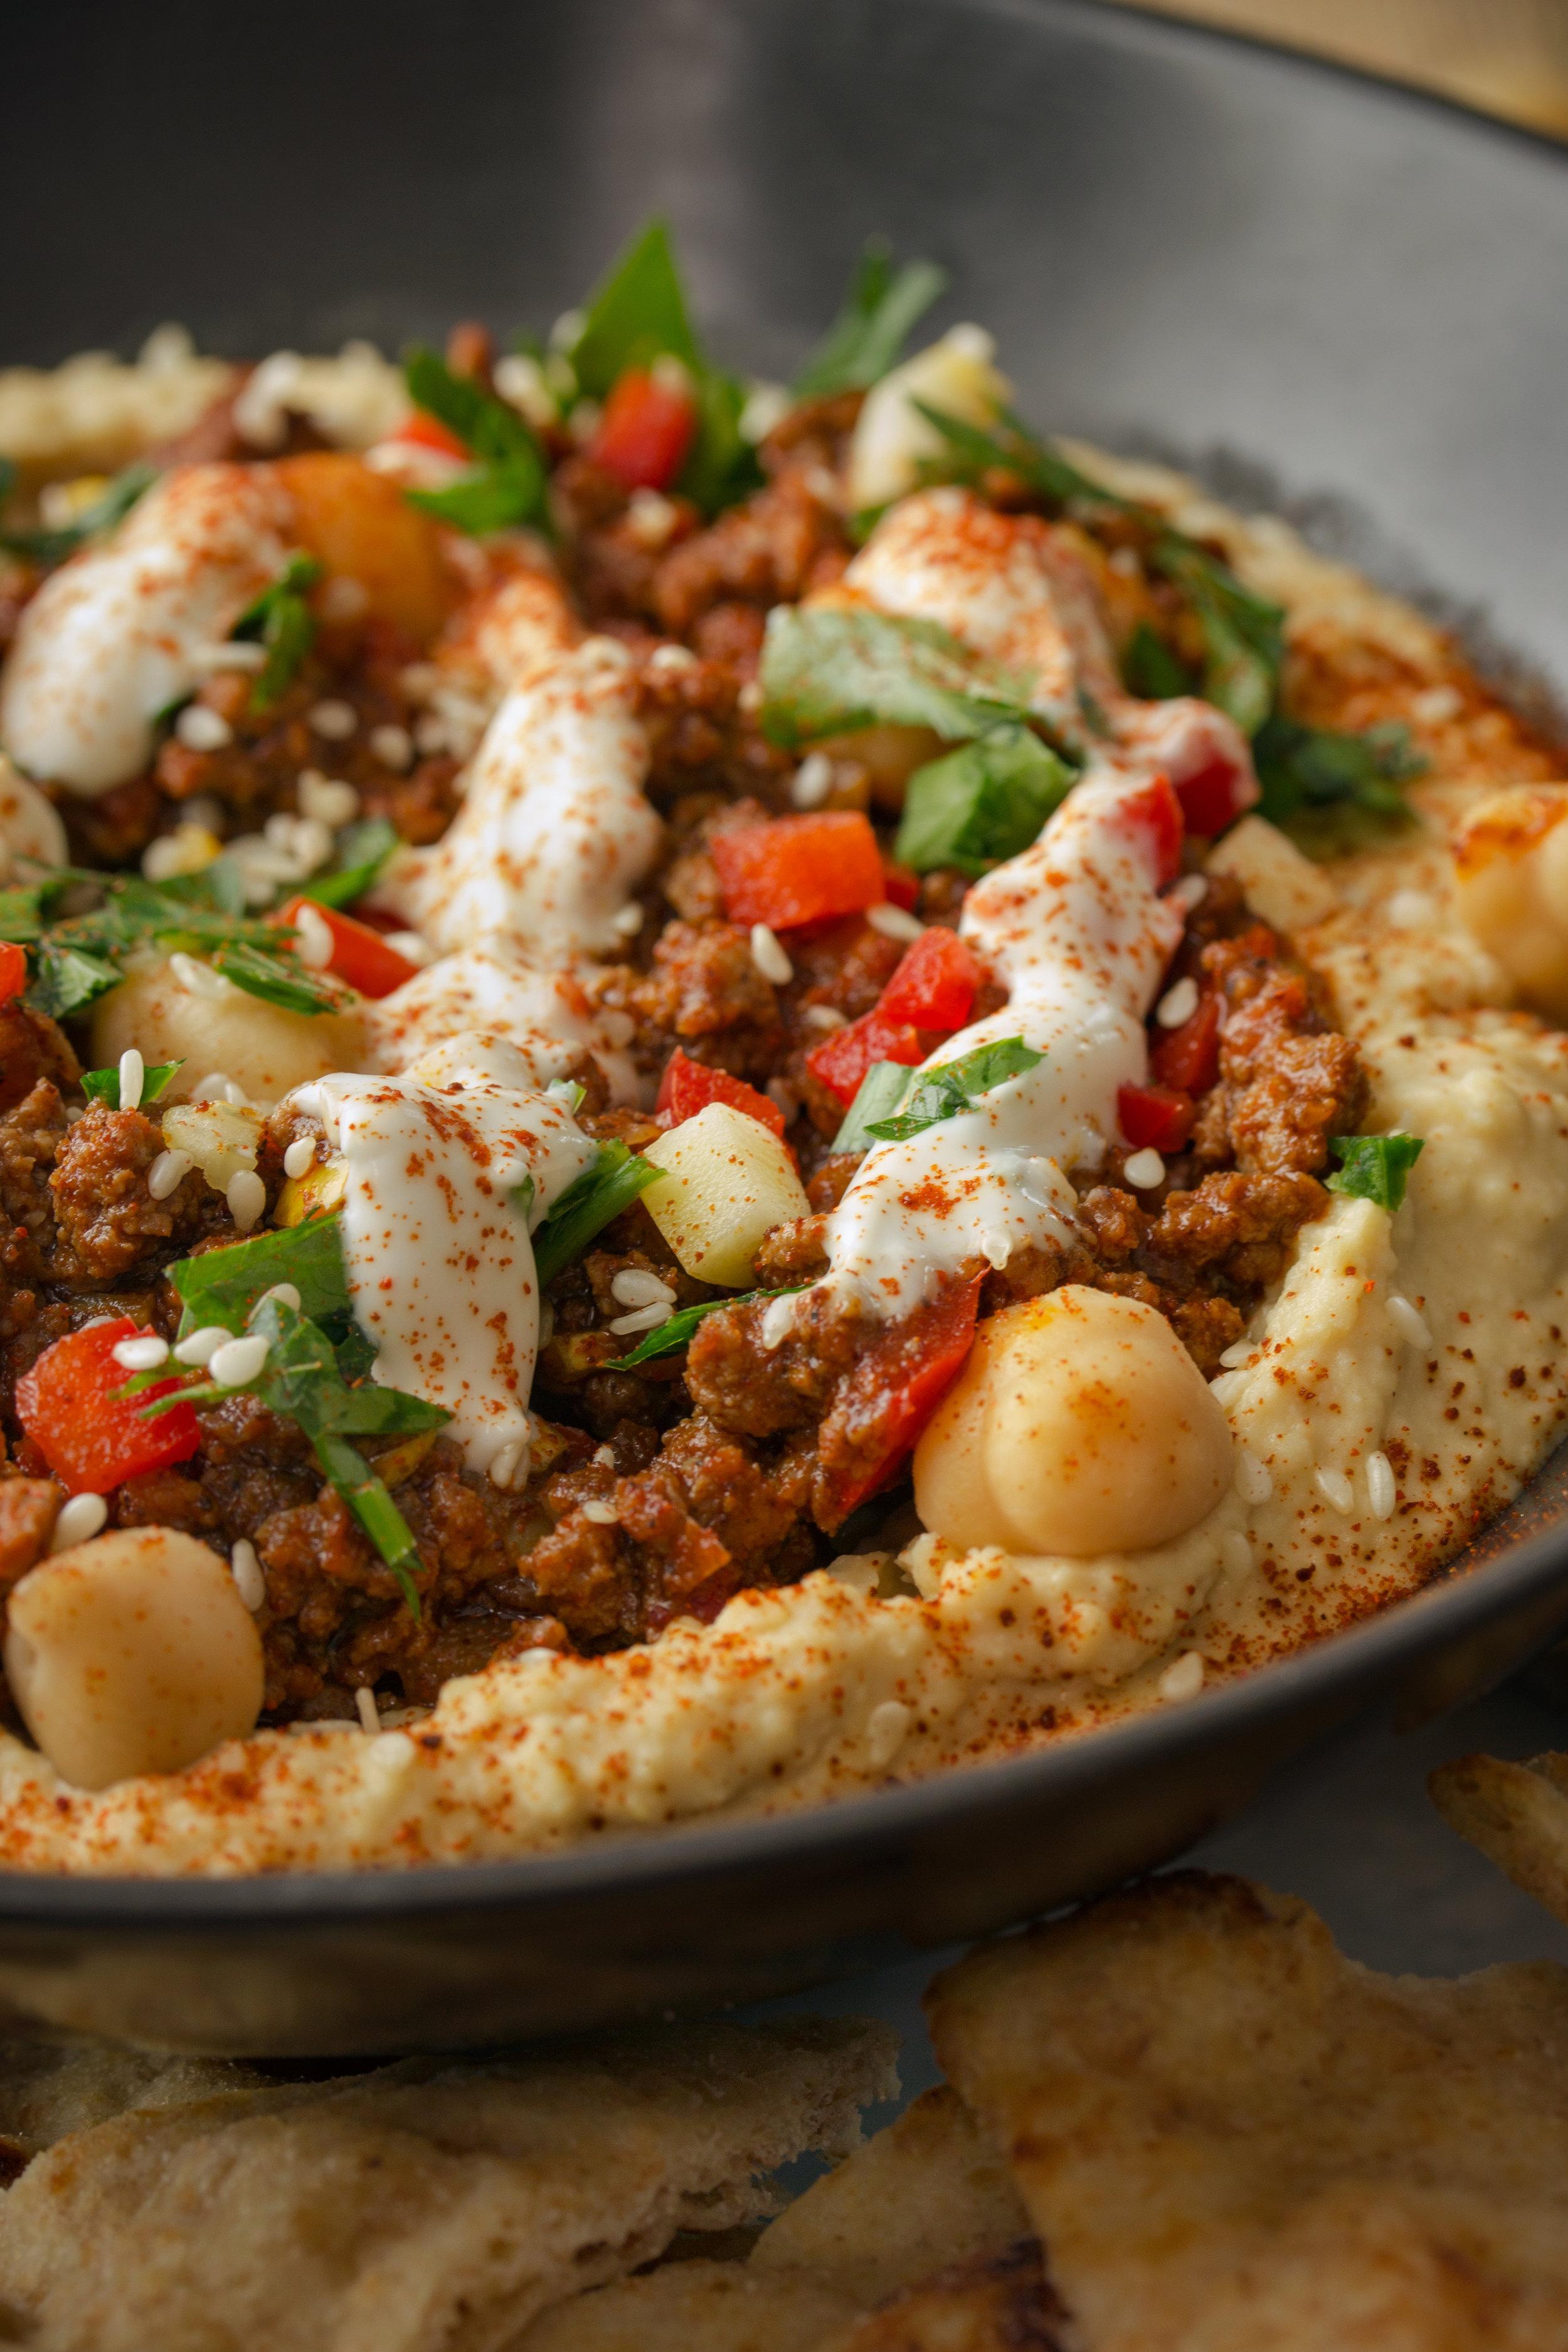 Hamshouka-Style Spiced Ground Meat Hummus